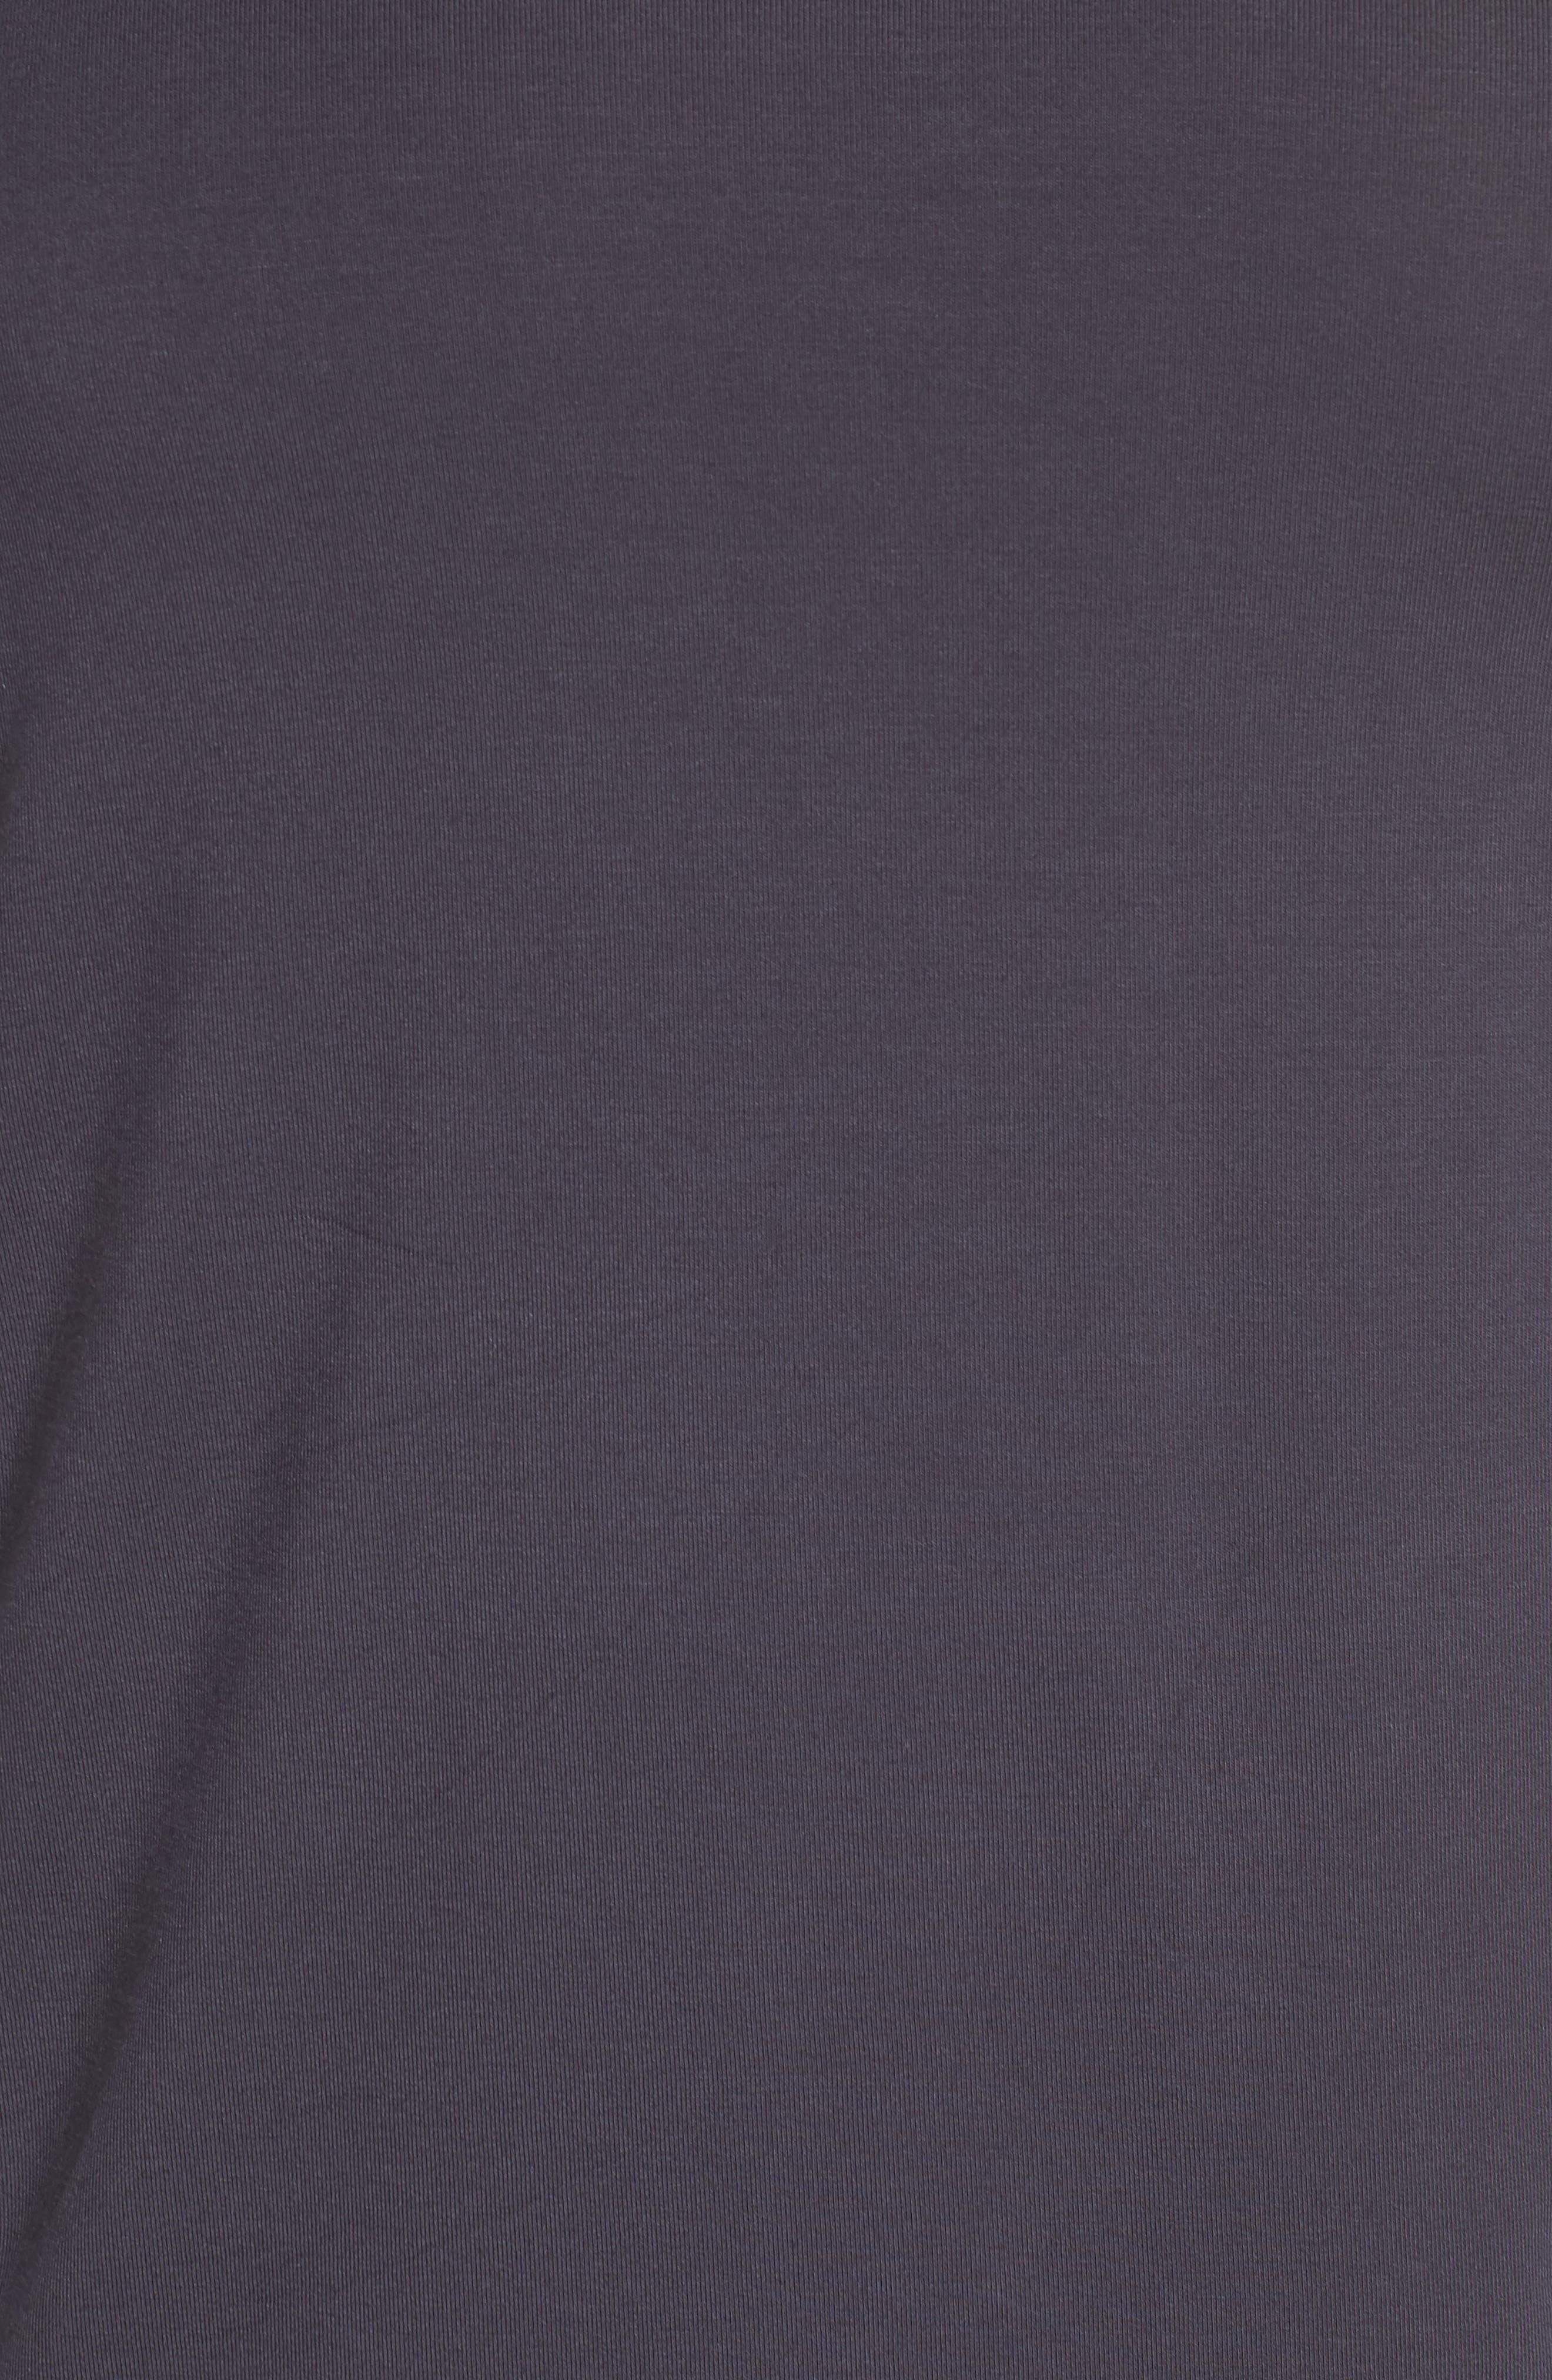 Back Stripe Tee,                             Alternate thumbnail 5, color,                             Charcoal Grey/ Navy